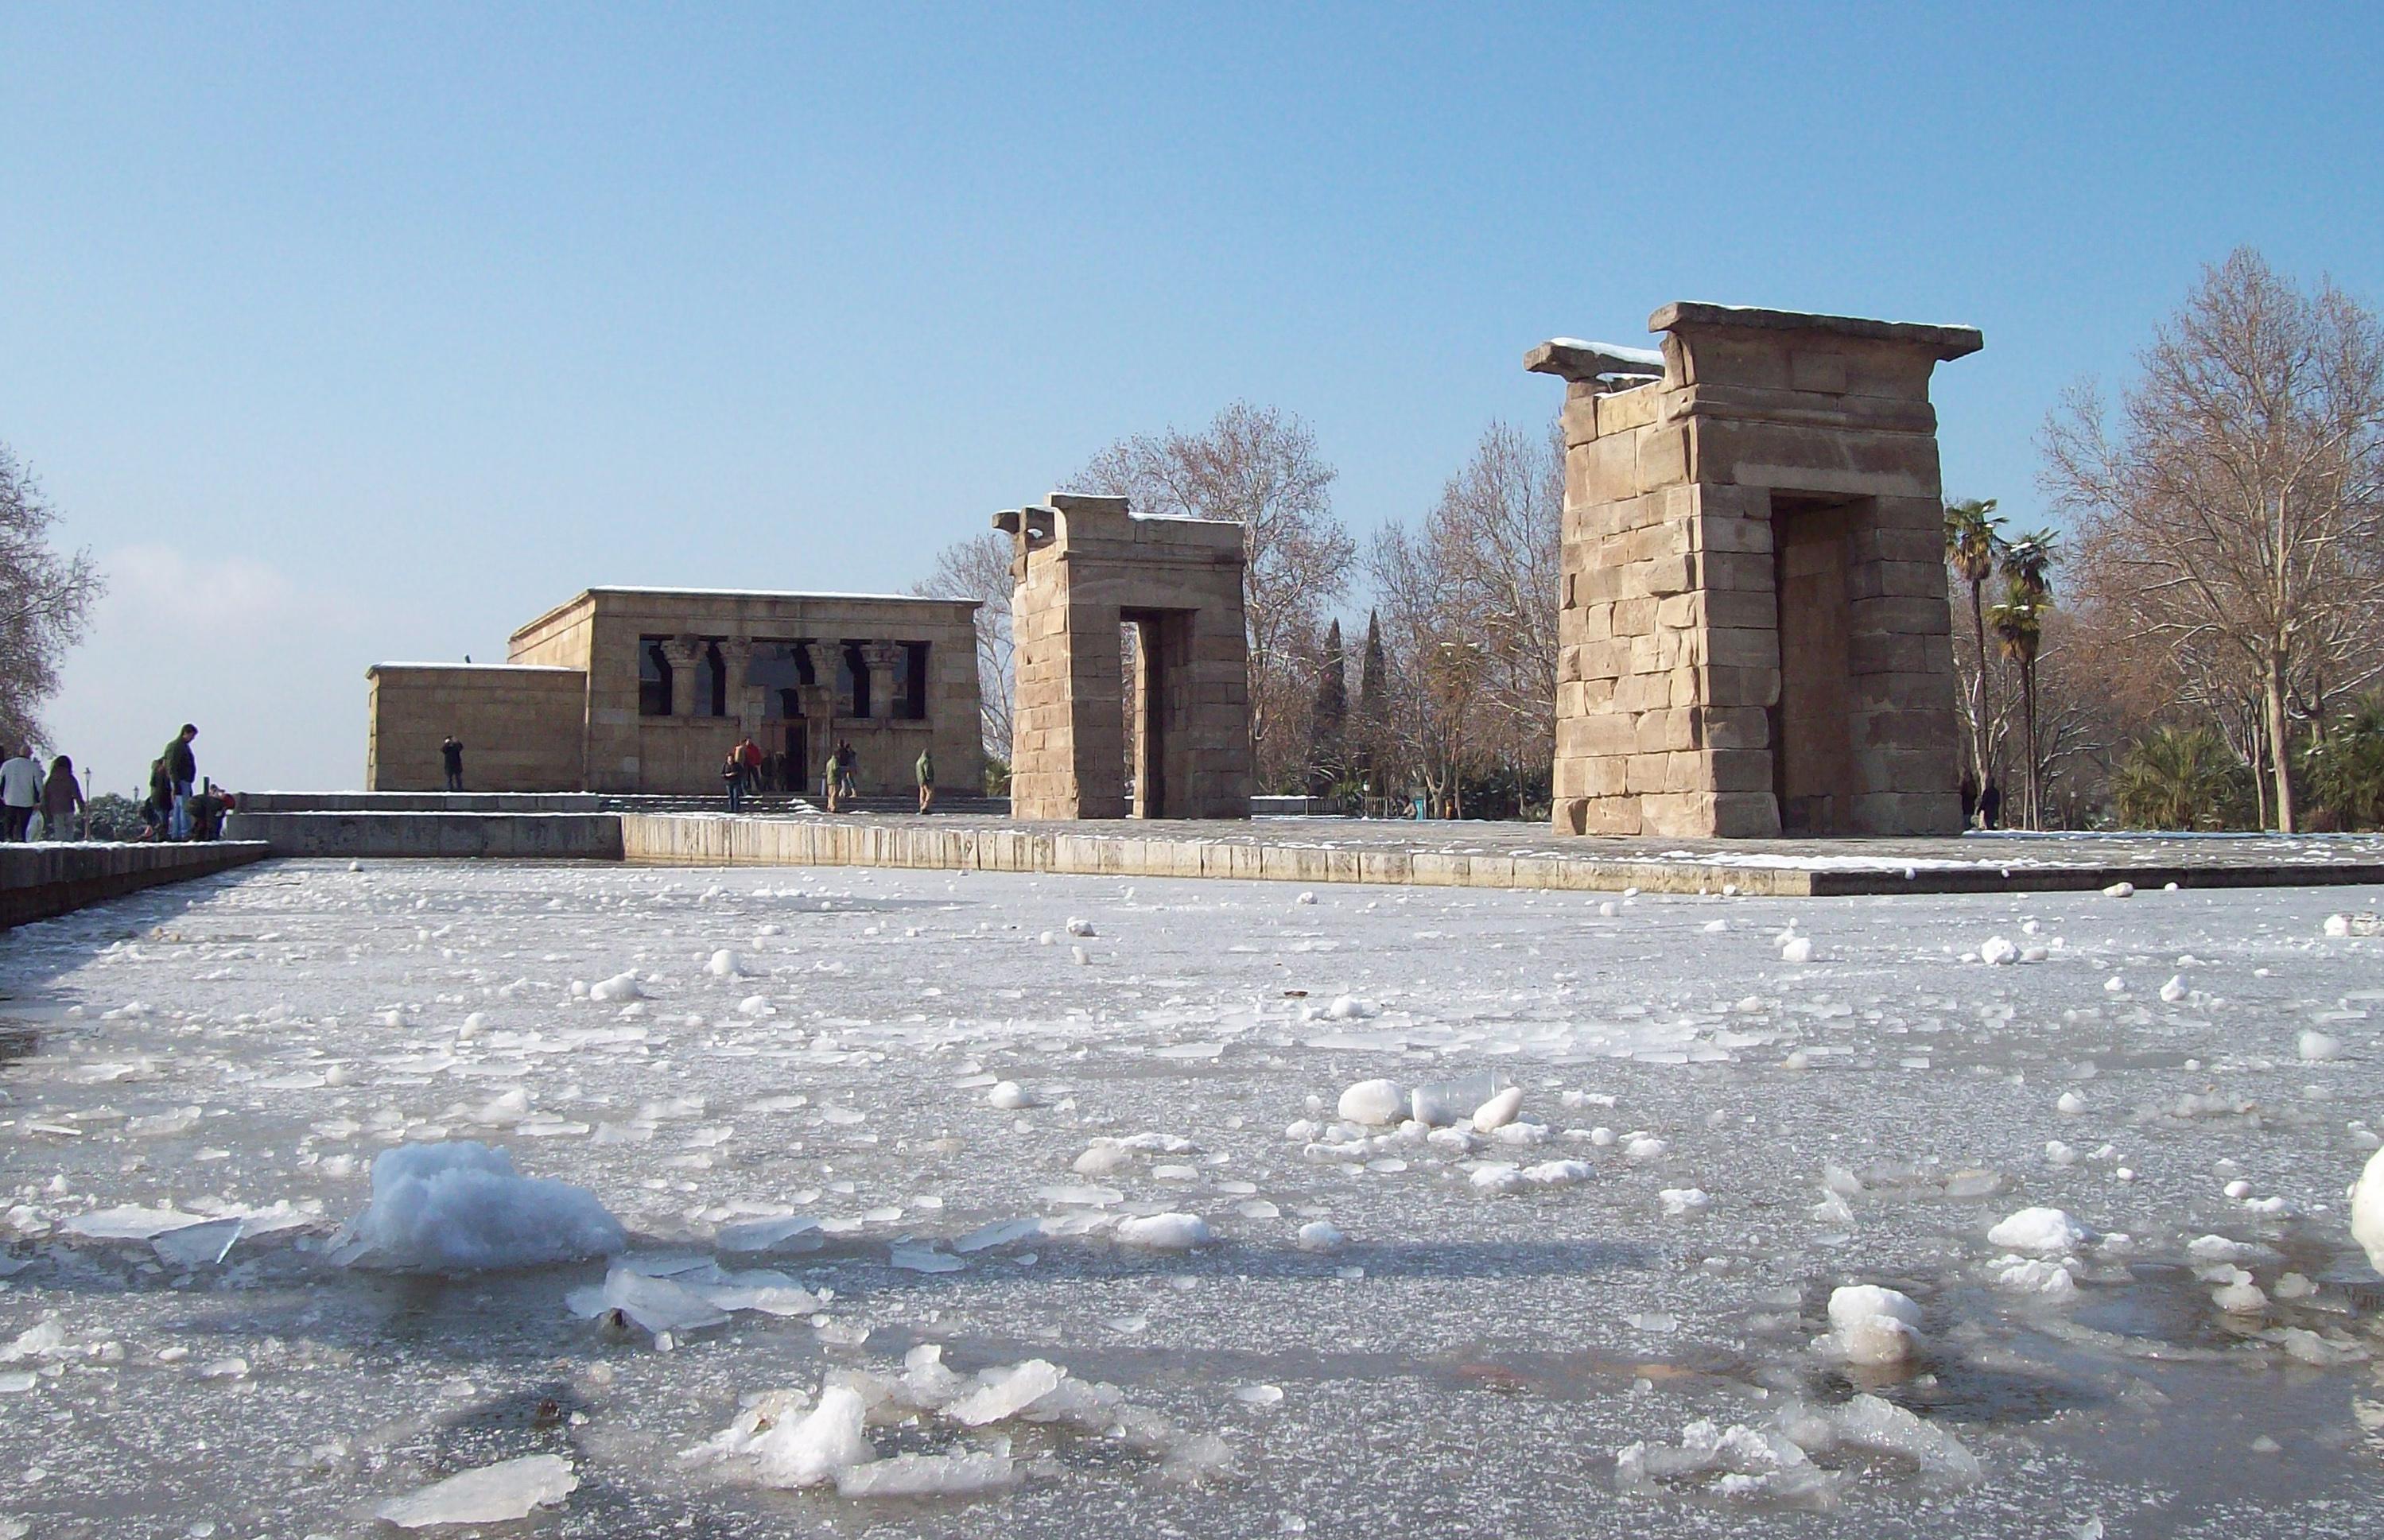 File:Templo de Debod (Madrid) 25.jpg - Wikipedia